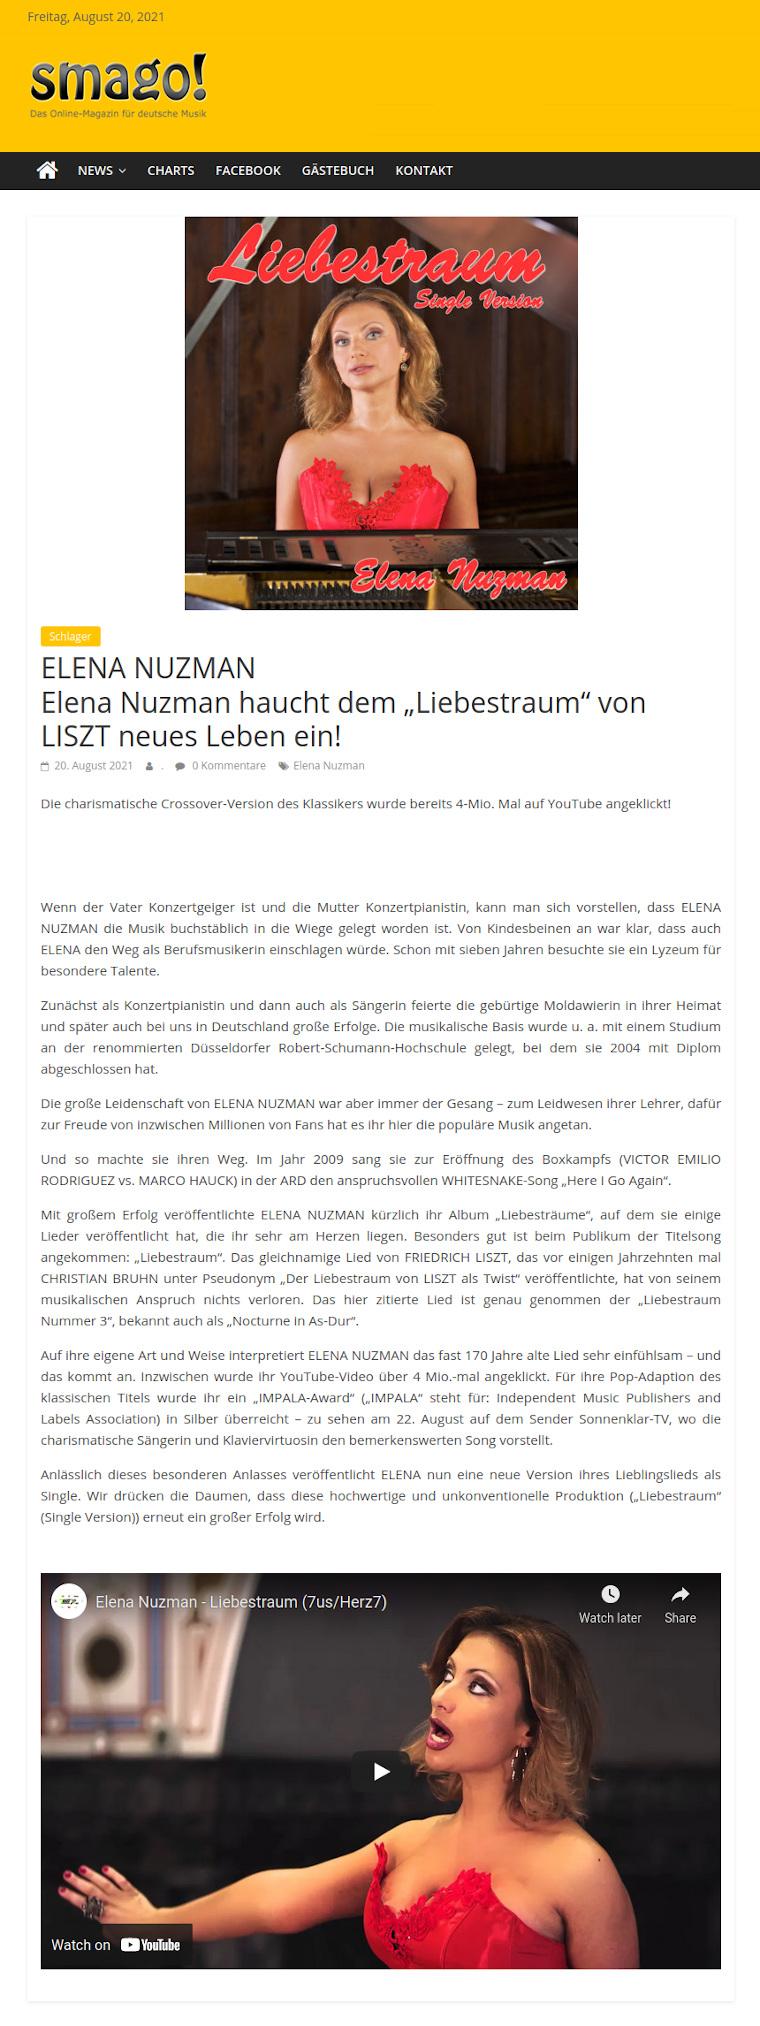 Elena Nuzman - smago.de - August 2021